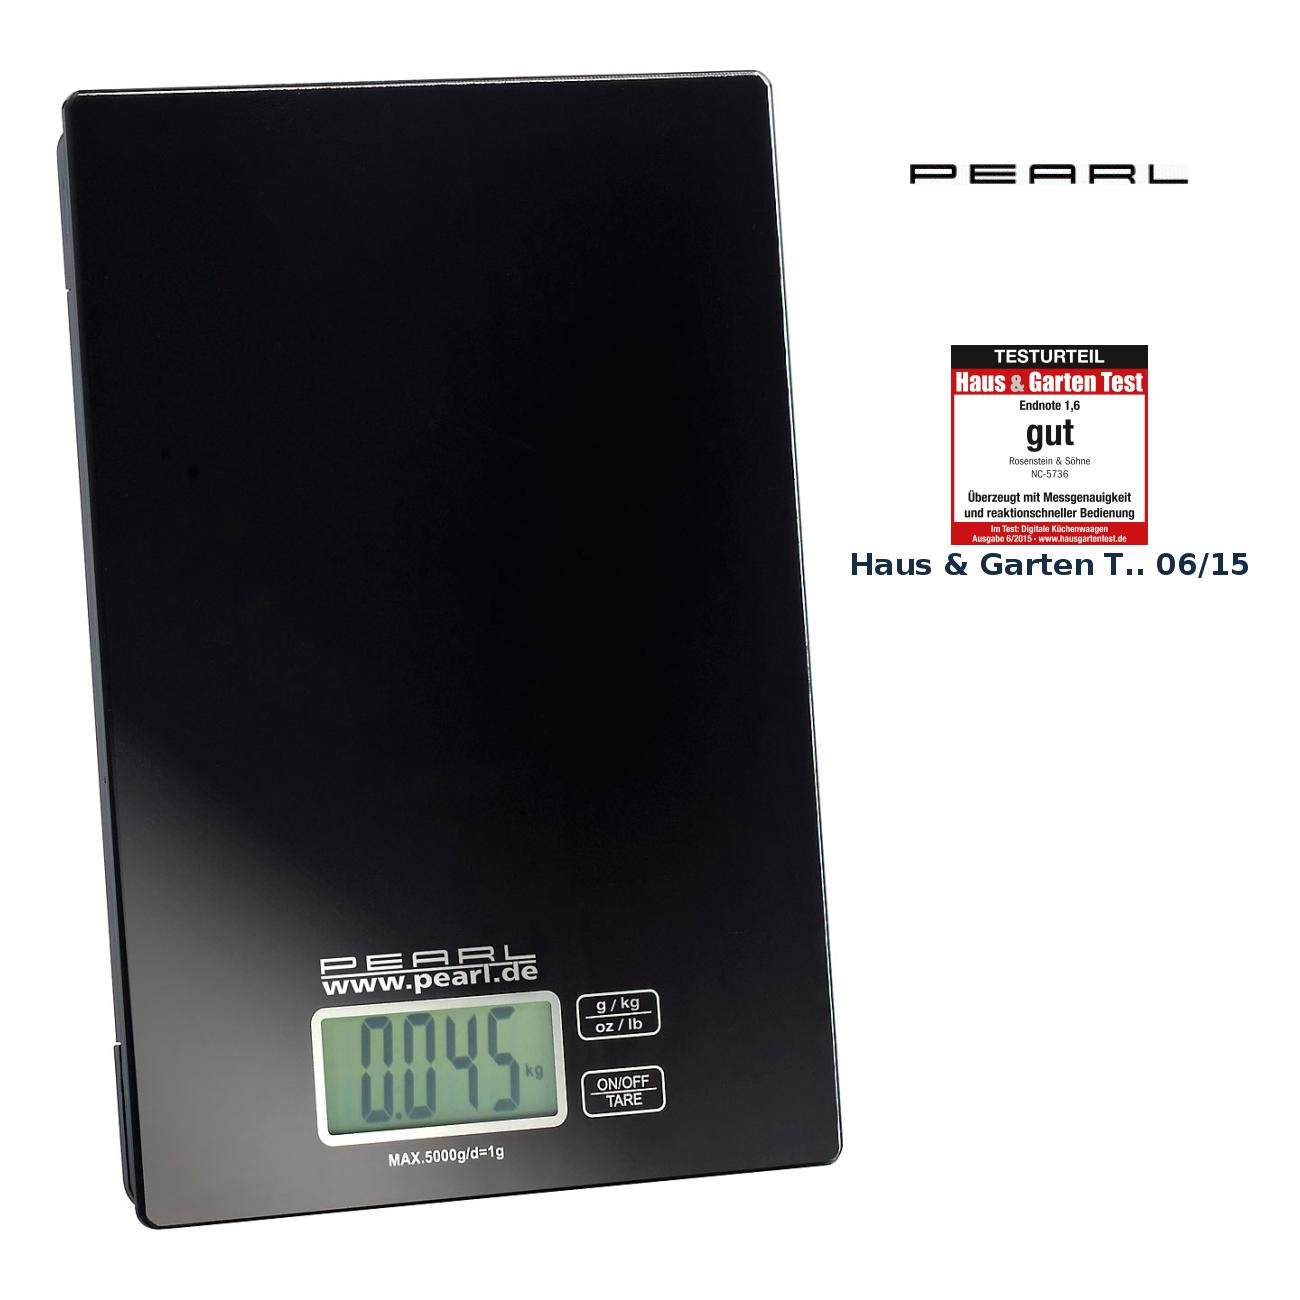 Amazon.de: PEARL Digitalwaage Küche: Digitale Küchenwaage, bis 5 kg ...